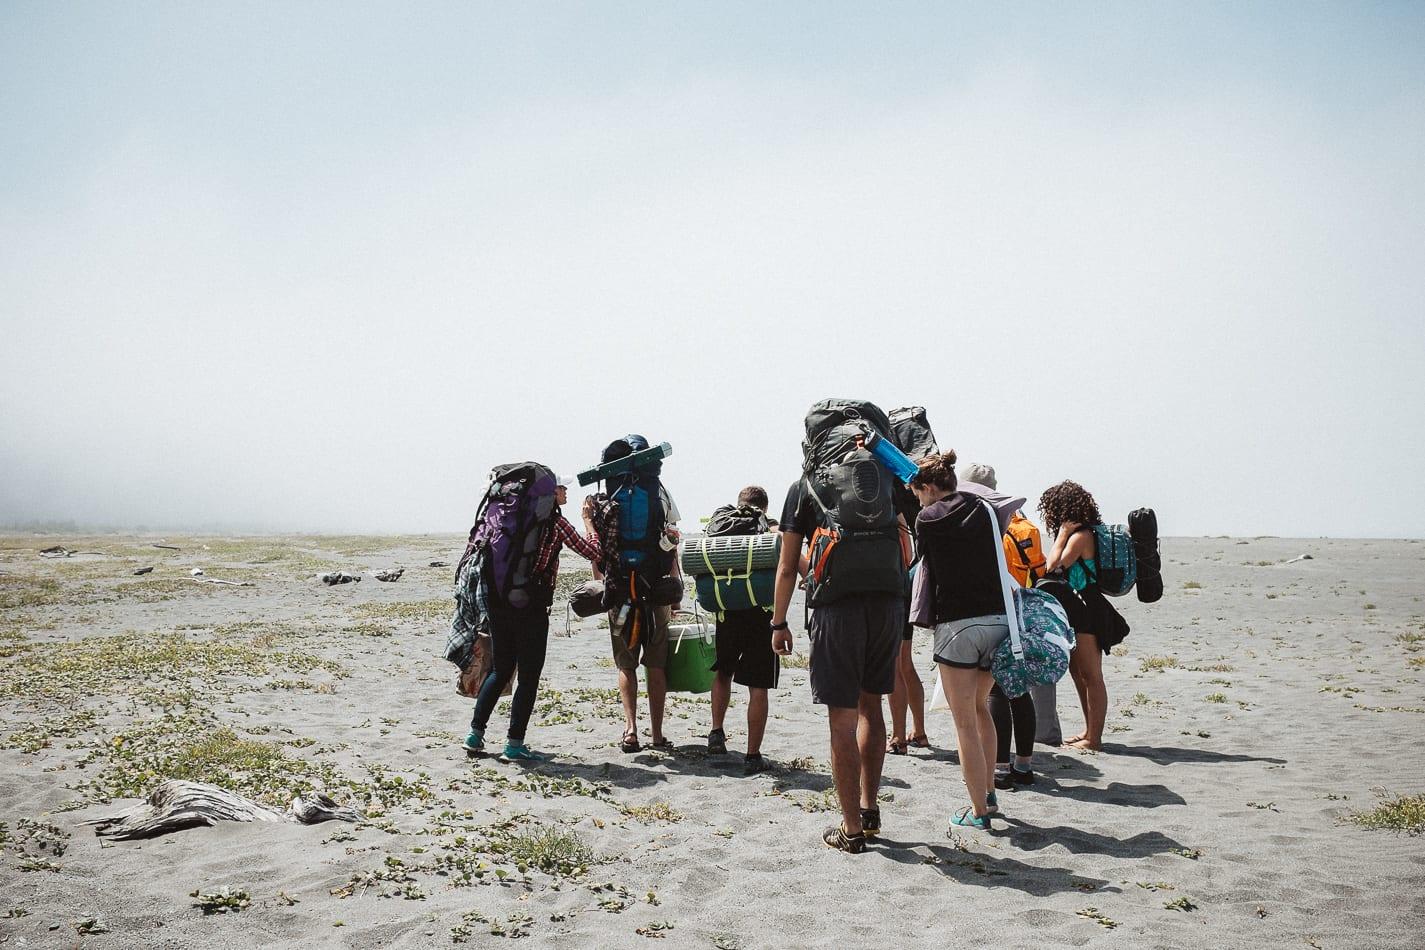 patricks-point-beach-camping-california-adventure-photographer-25